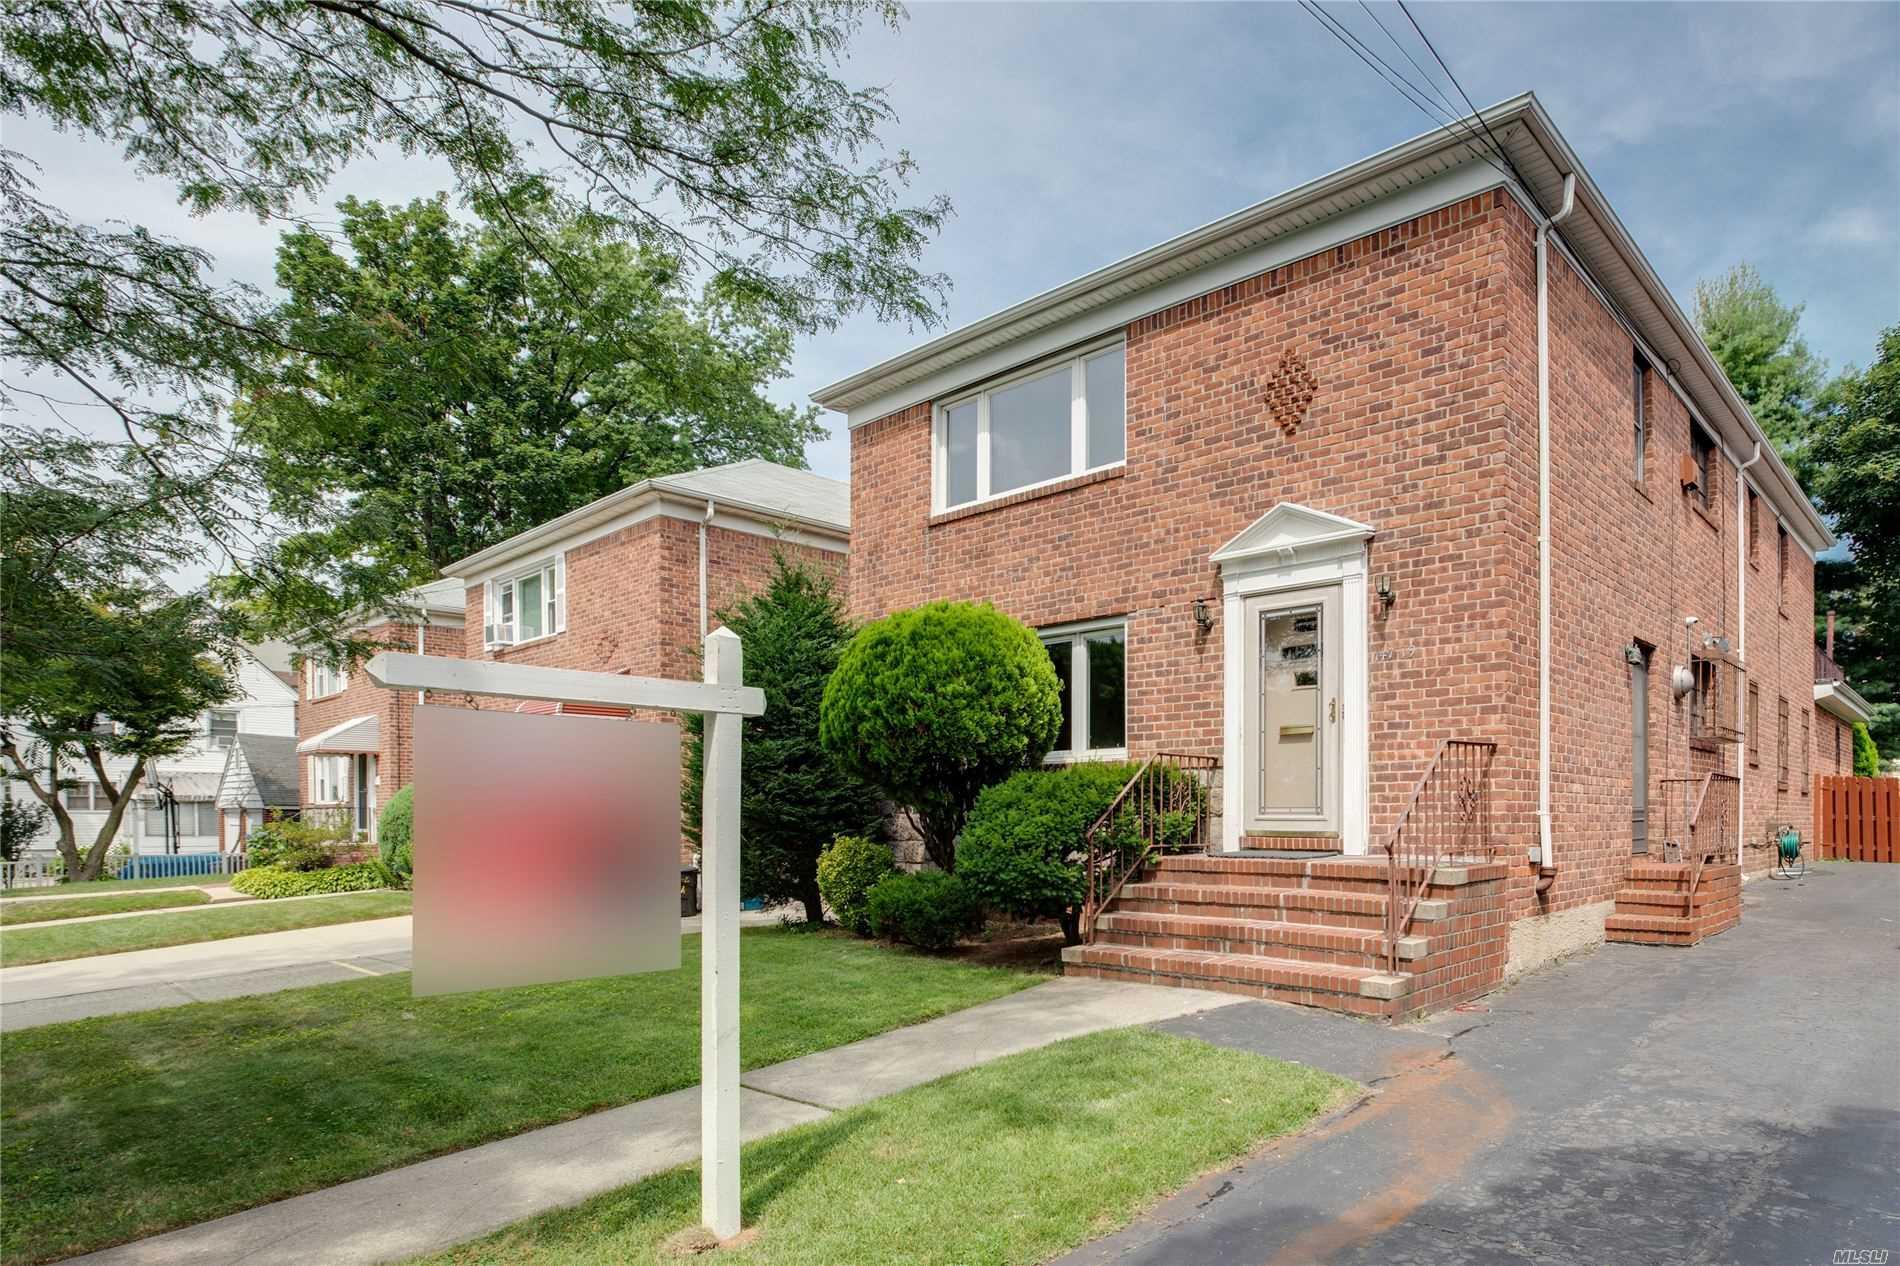 Property for sale at 147-19 Ash Avenue, Flushing NY 11355, Flushing,  New York 11355